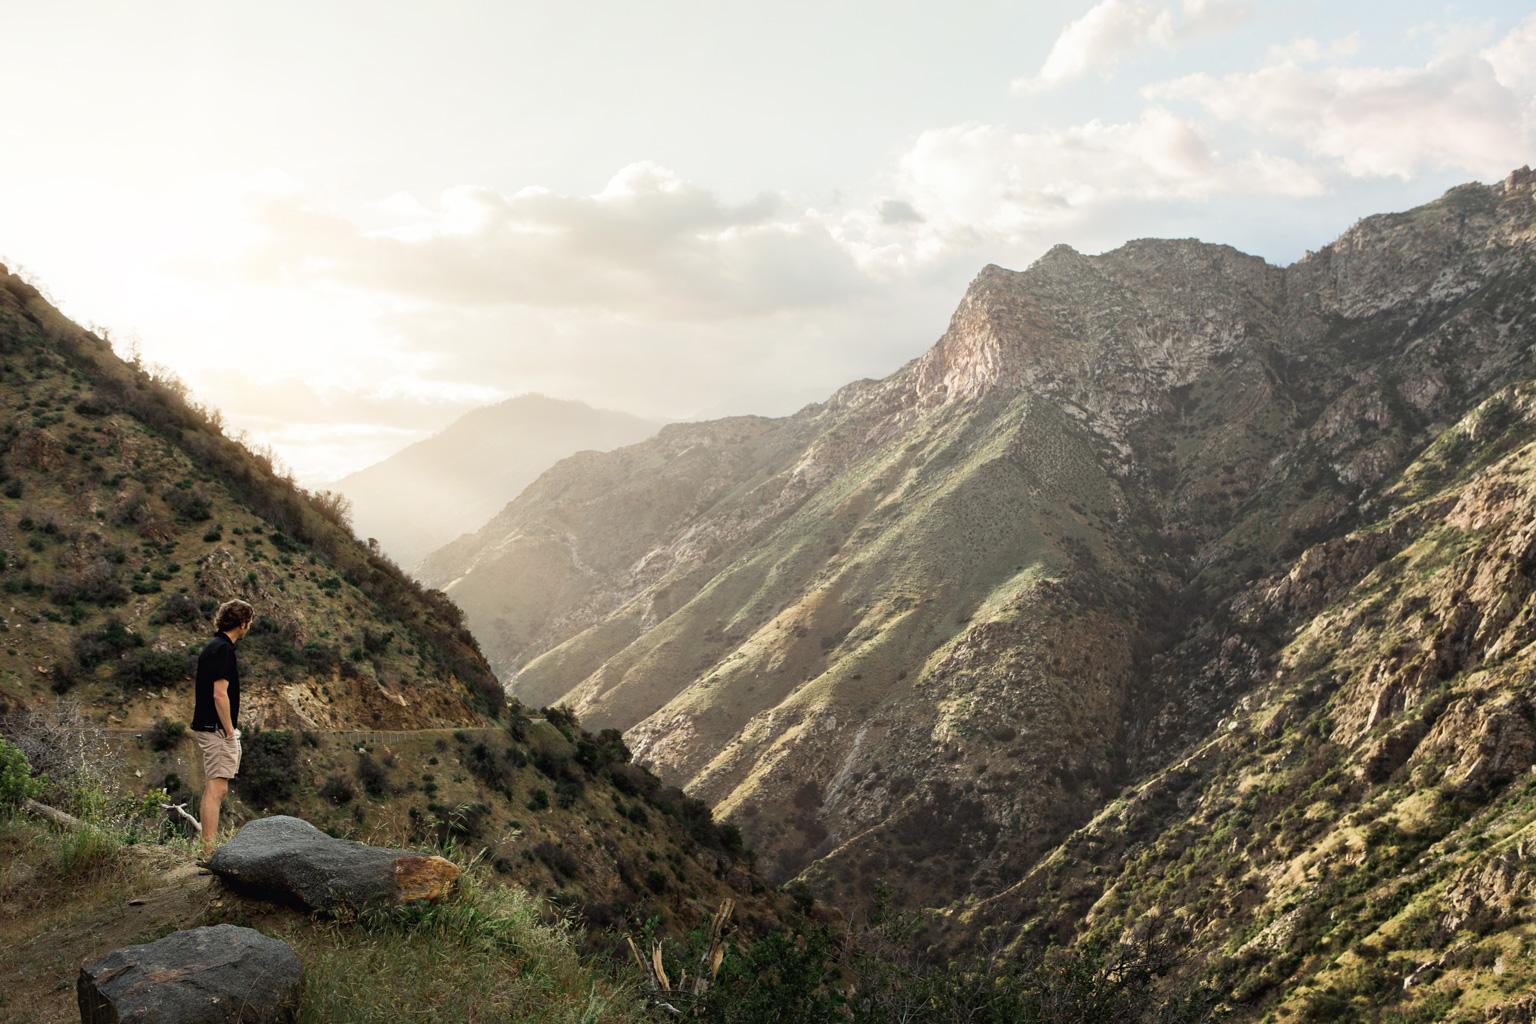 CindyGiovagnoli_Sequoia_Kings_Canyon_National_Park_California_bear_camping_roadtrip_travel-007.jpg